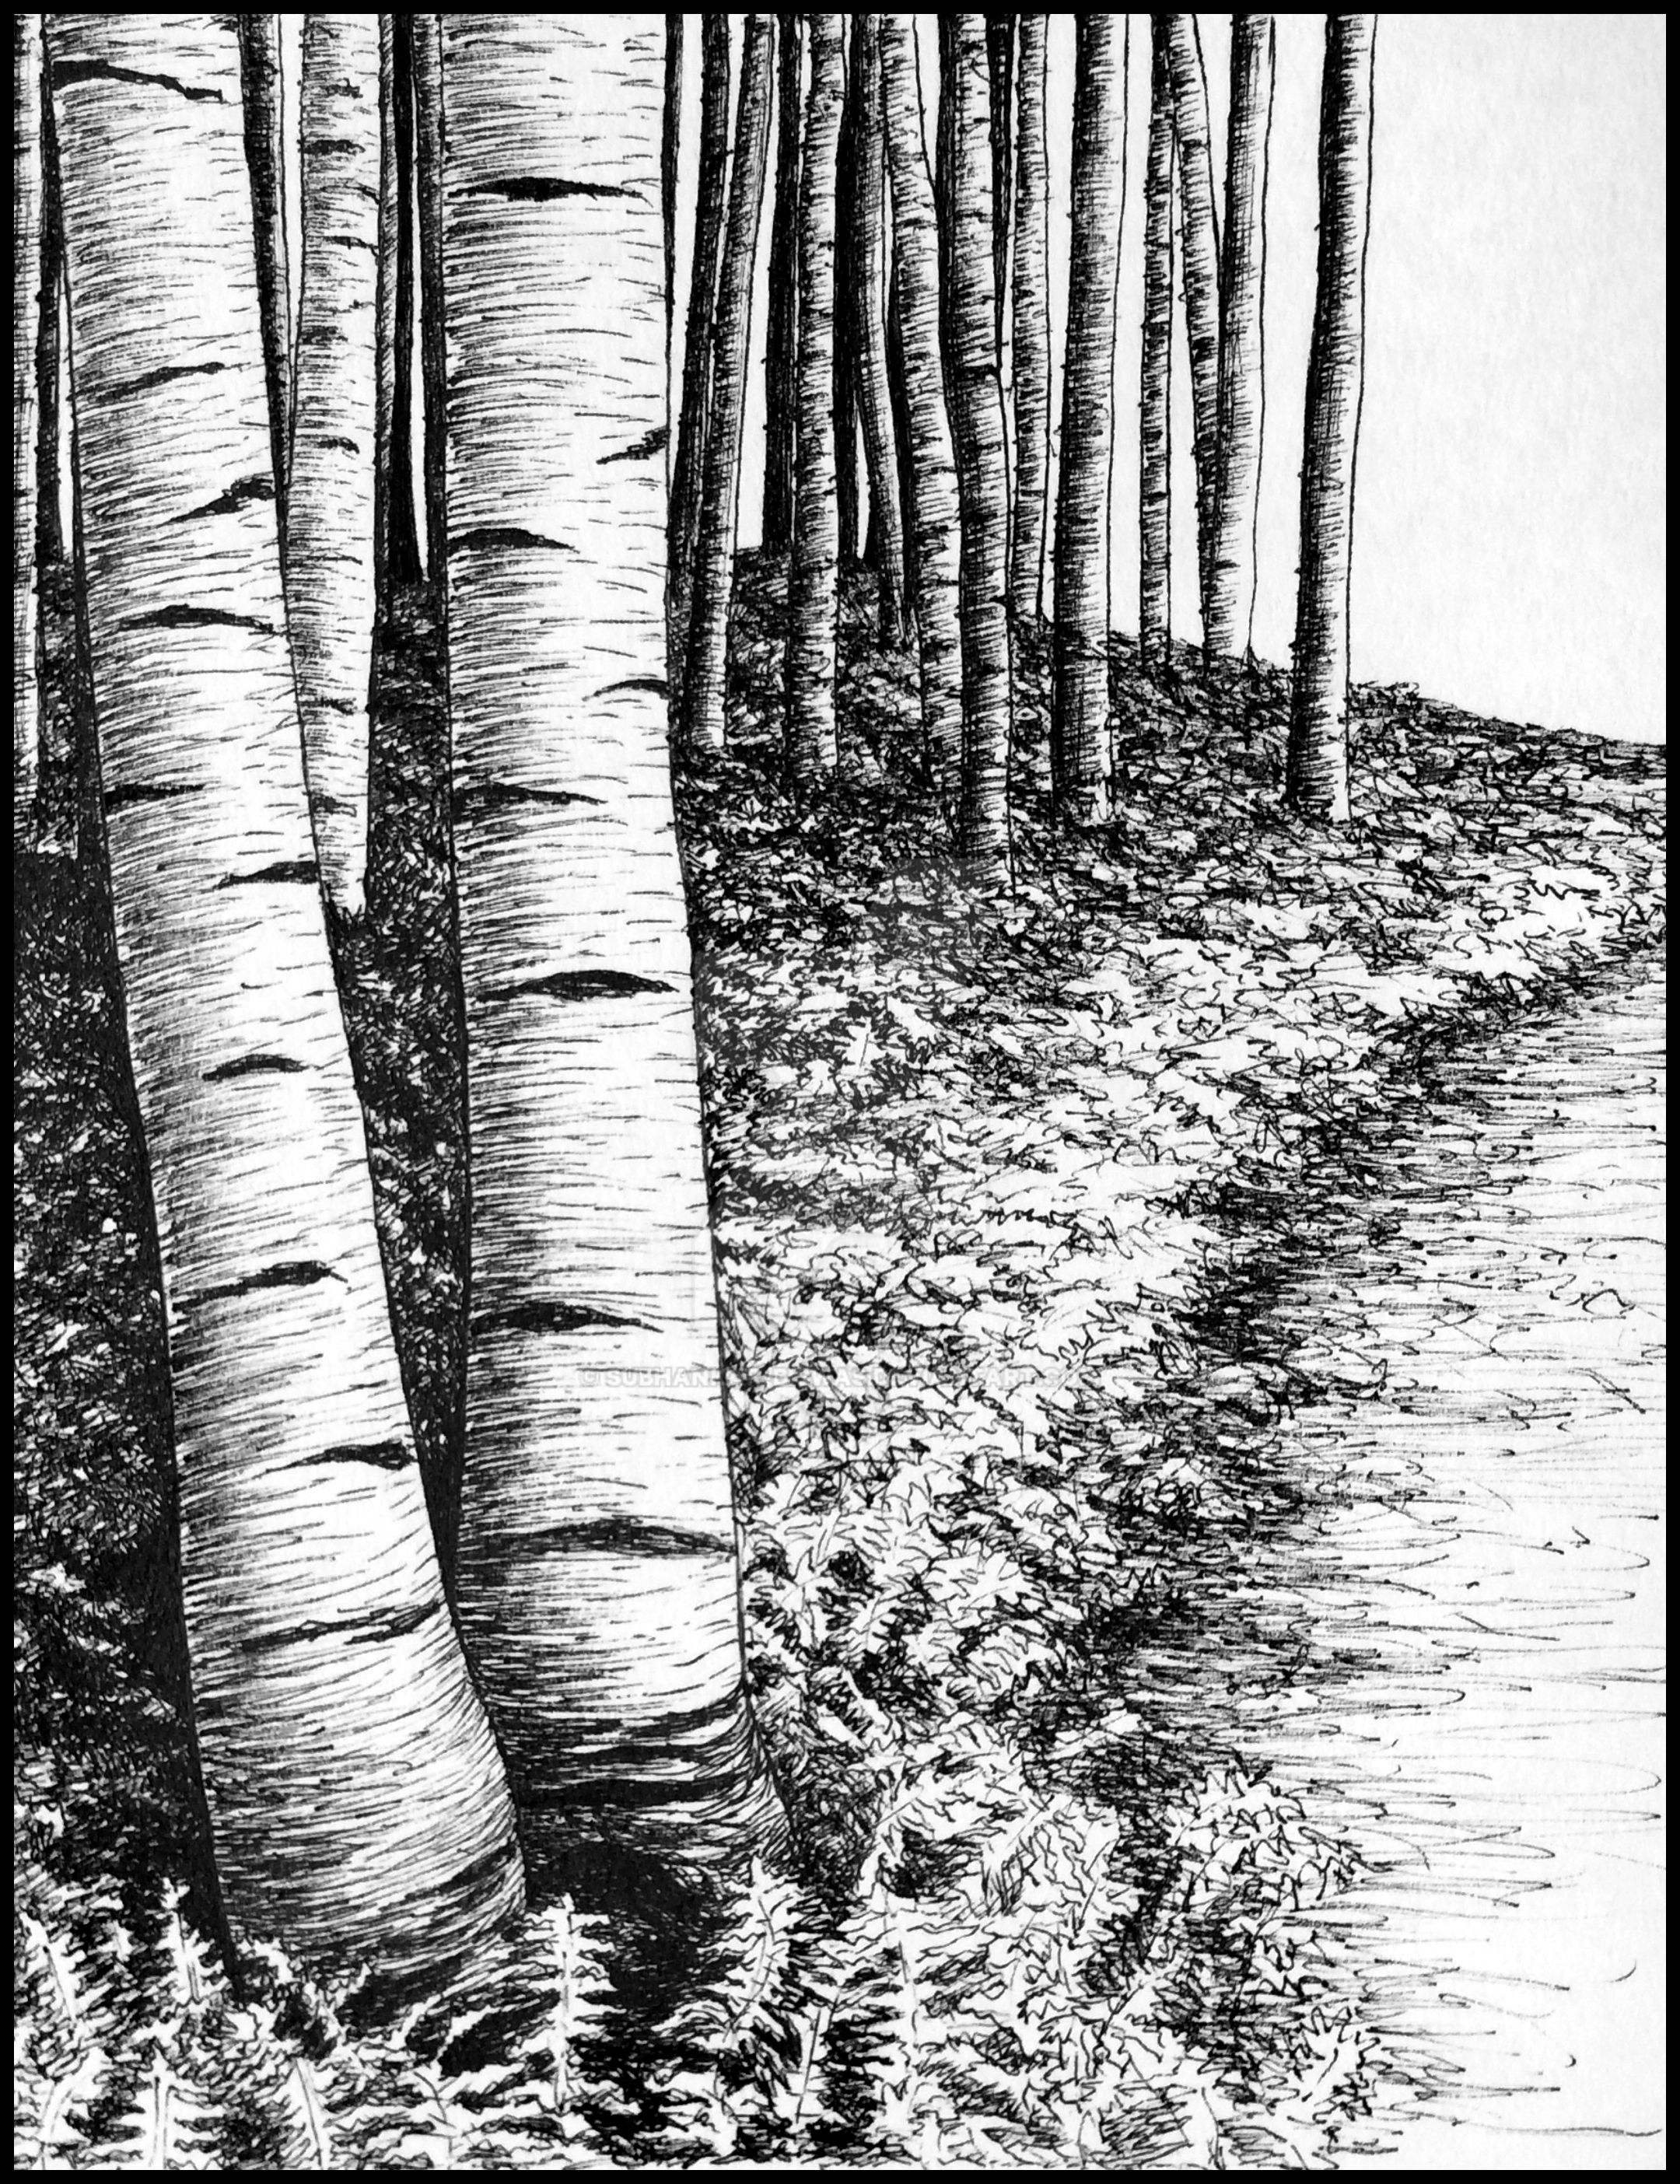 Birch trees by subhankar-biswas